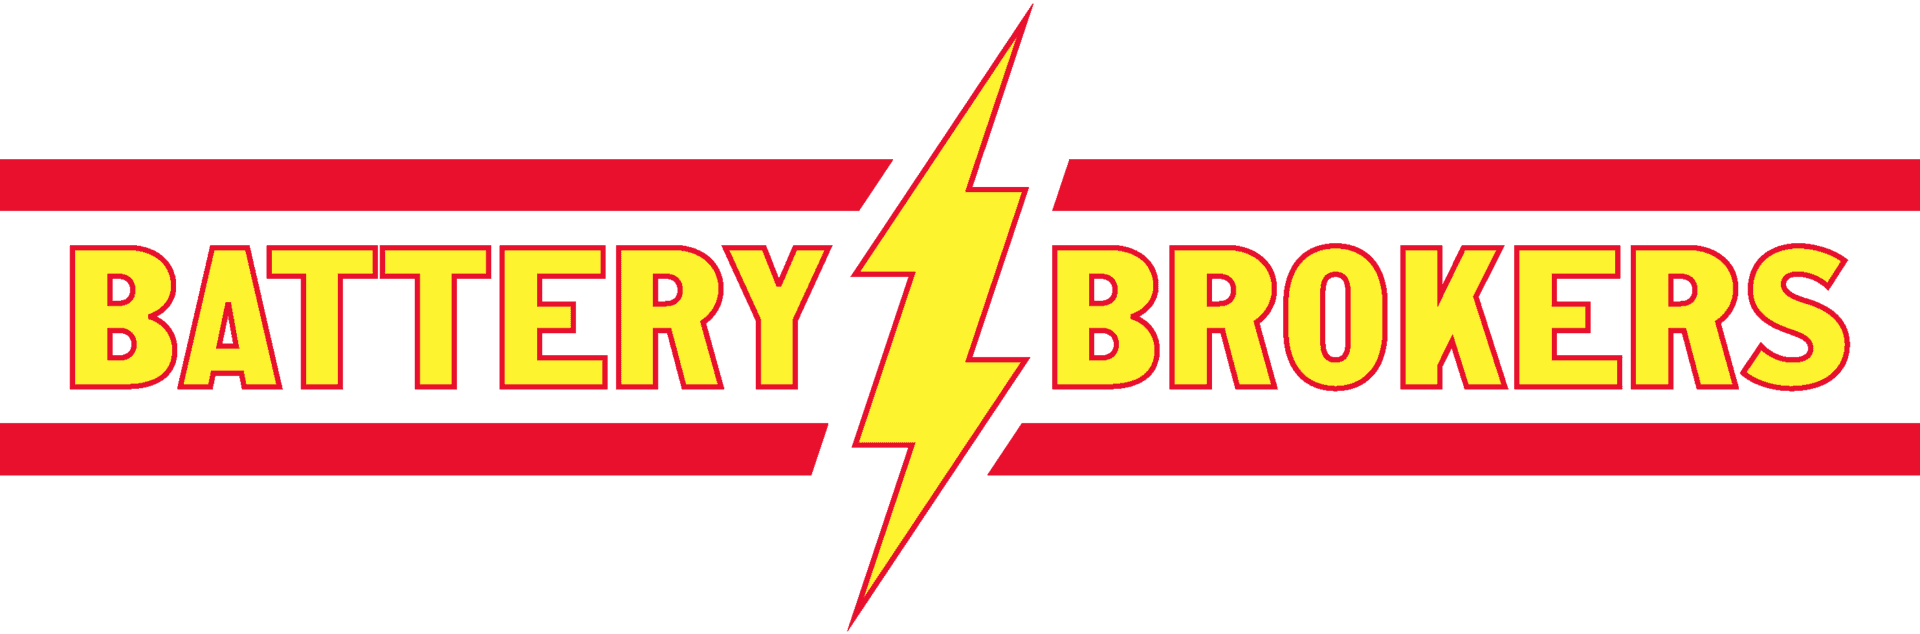 battery brokers logo yellow